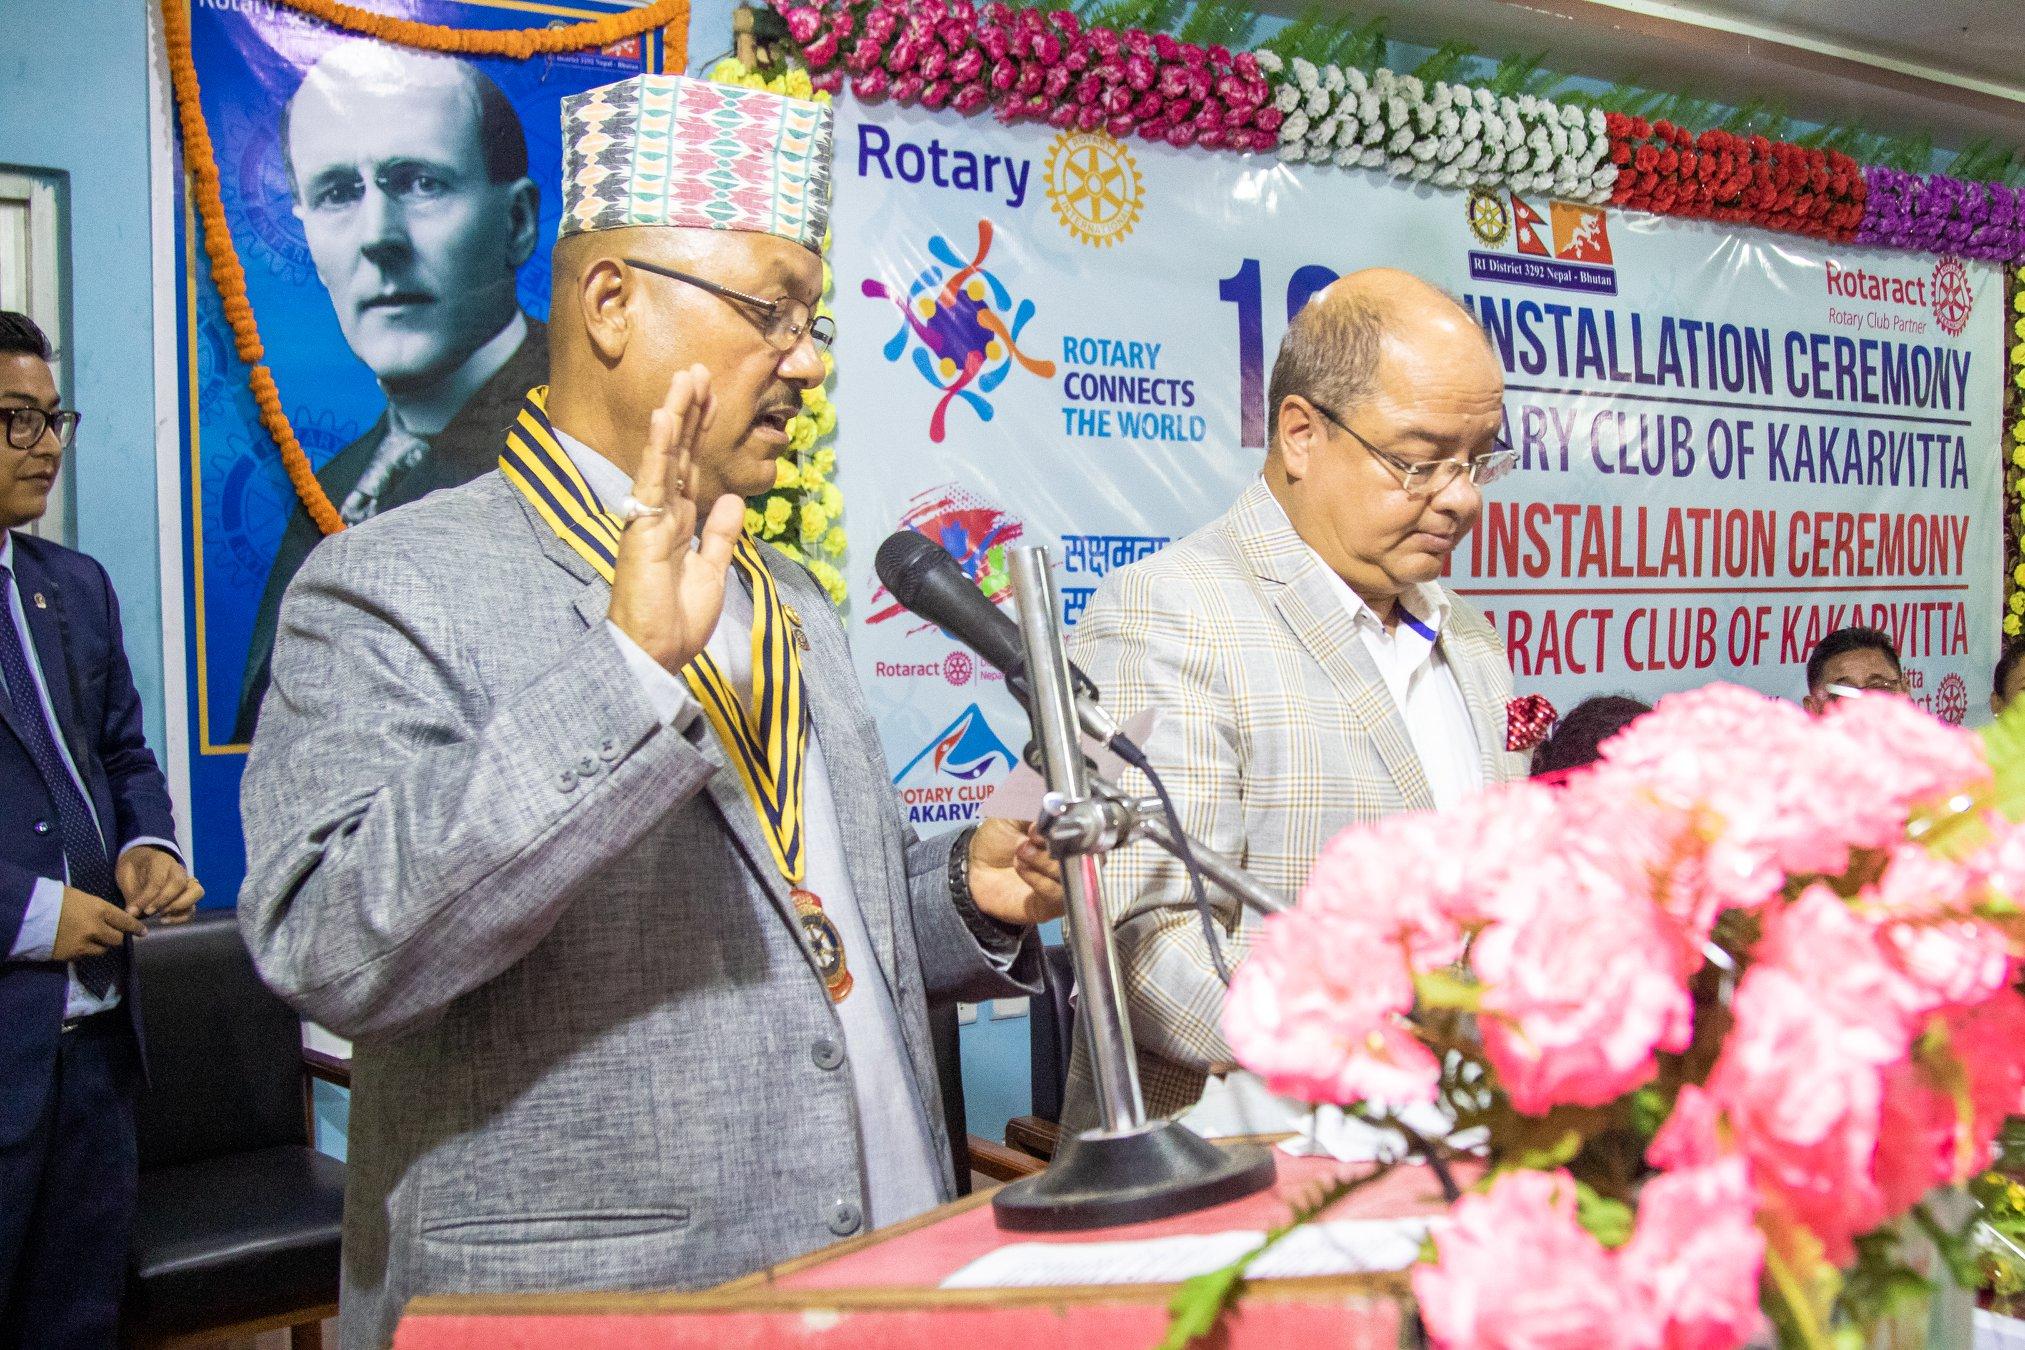 10th Installation Ceremony Rotary Club Of Kakarvitta 11